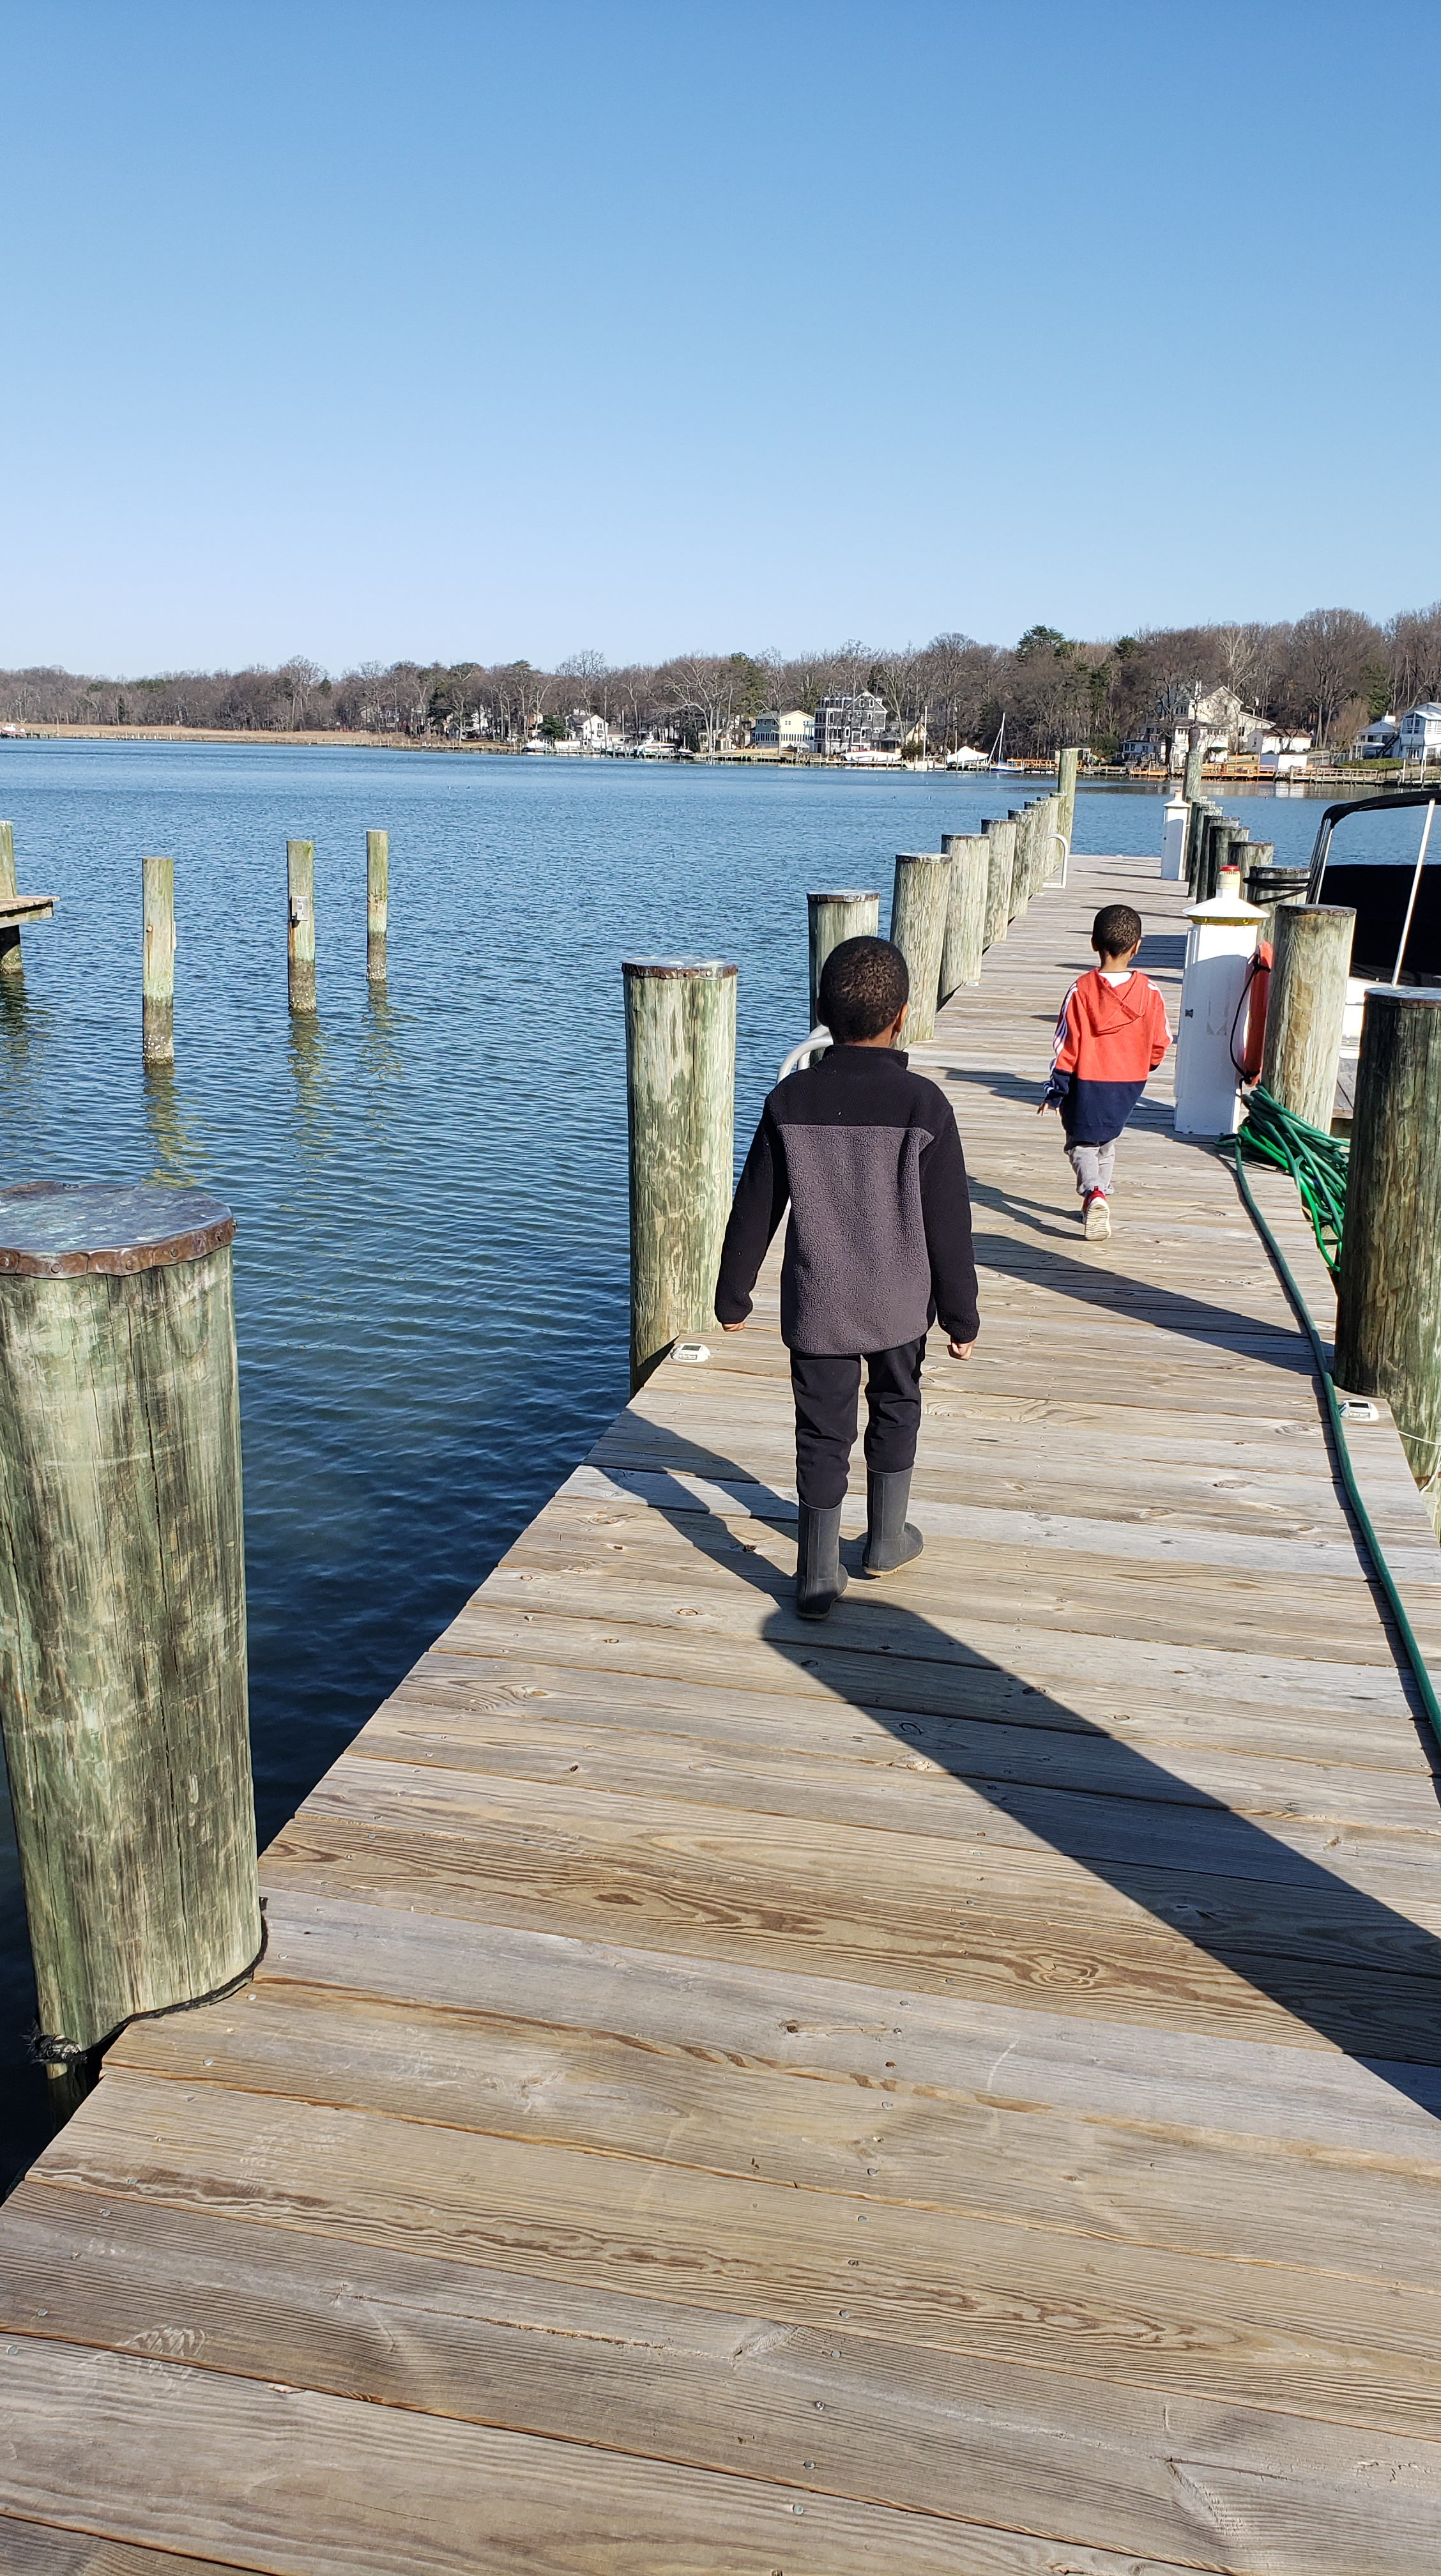 Two kids walking down a pier.